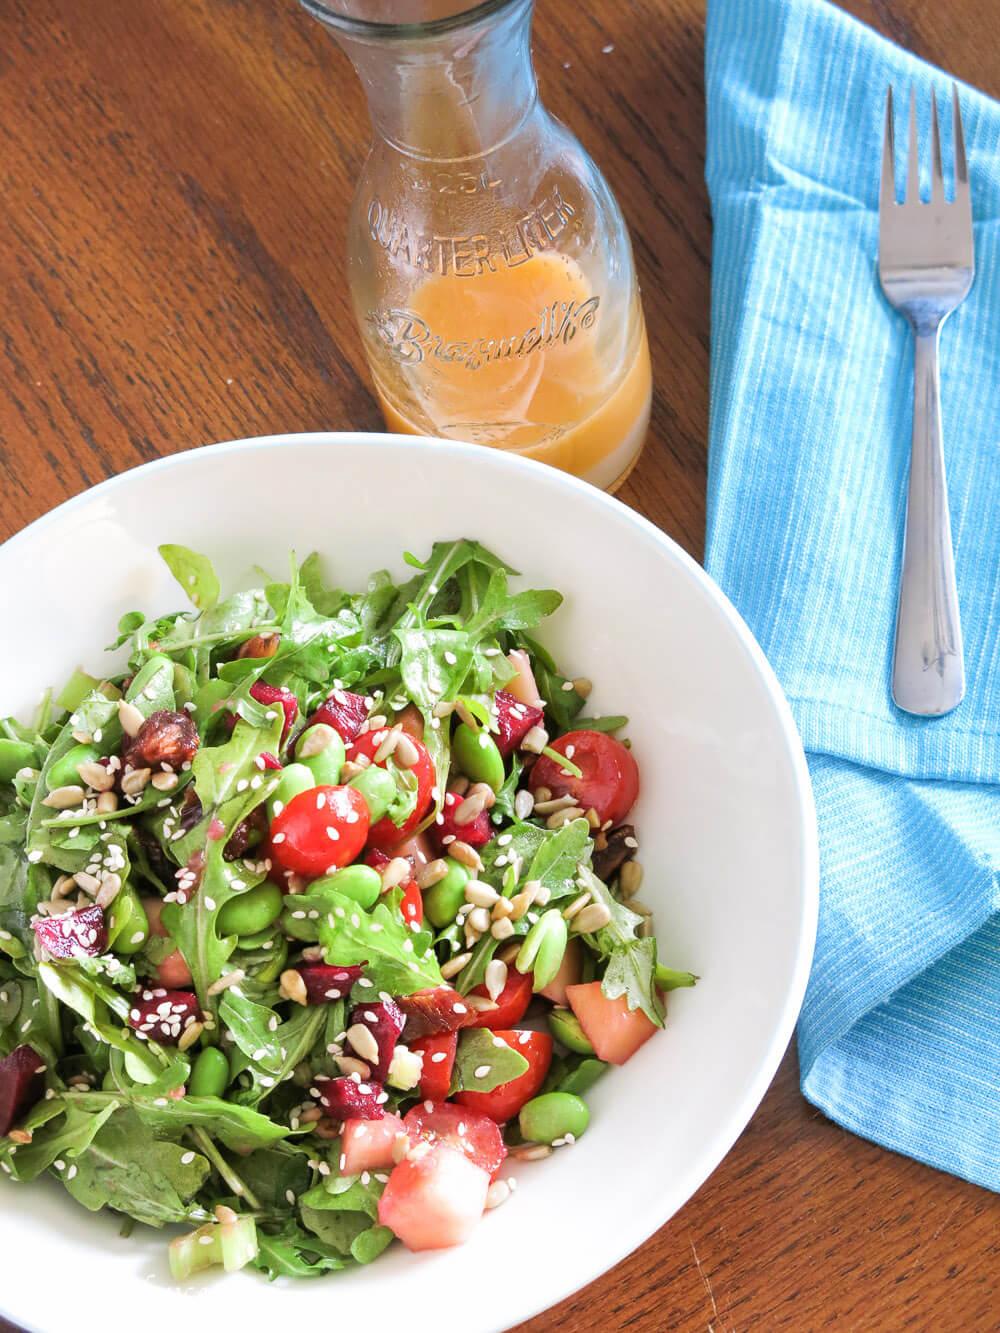 arugula and edamame salad with ruby red vinaigrette | infinebalance.com